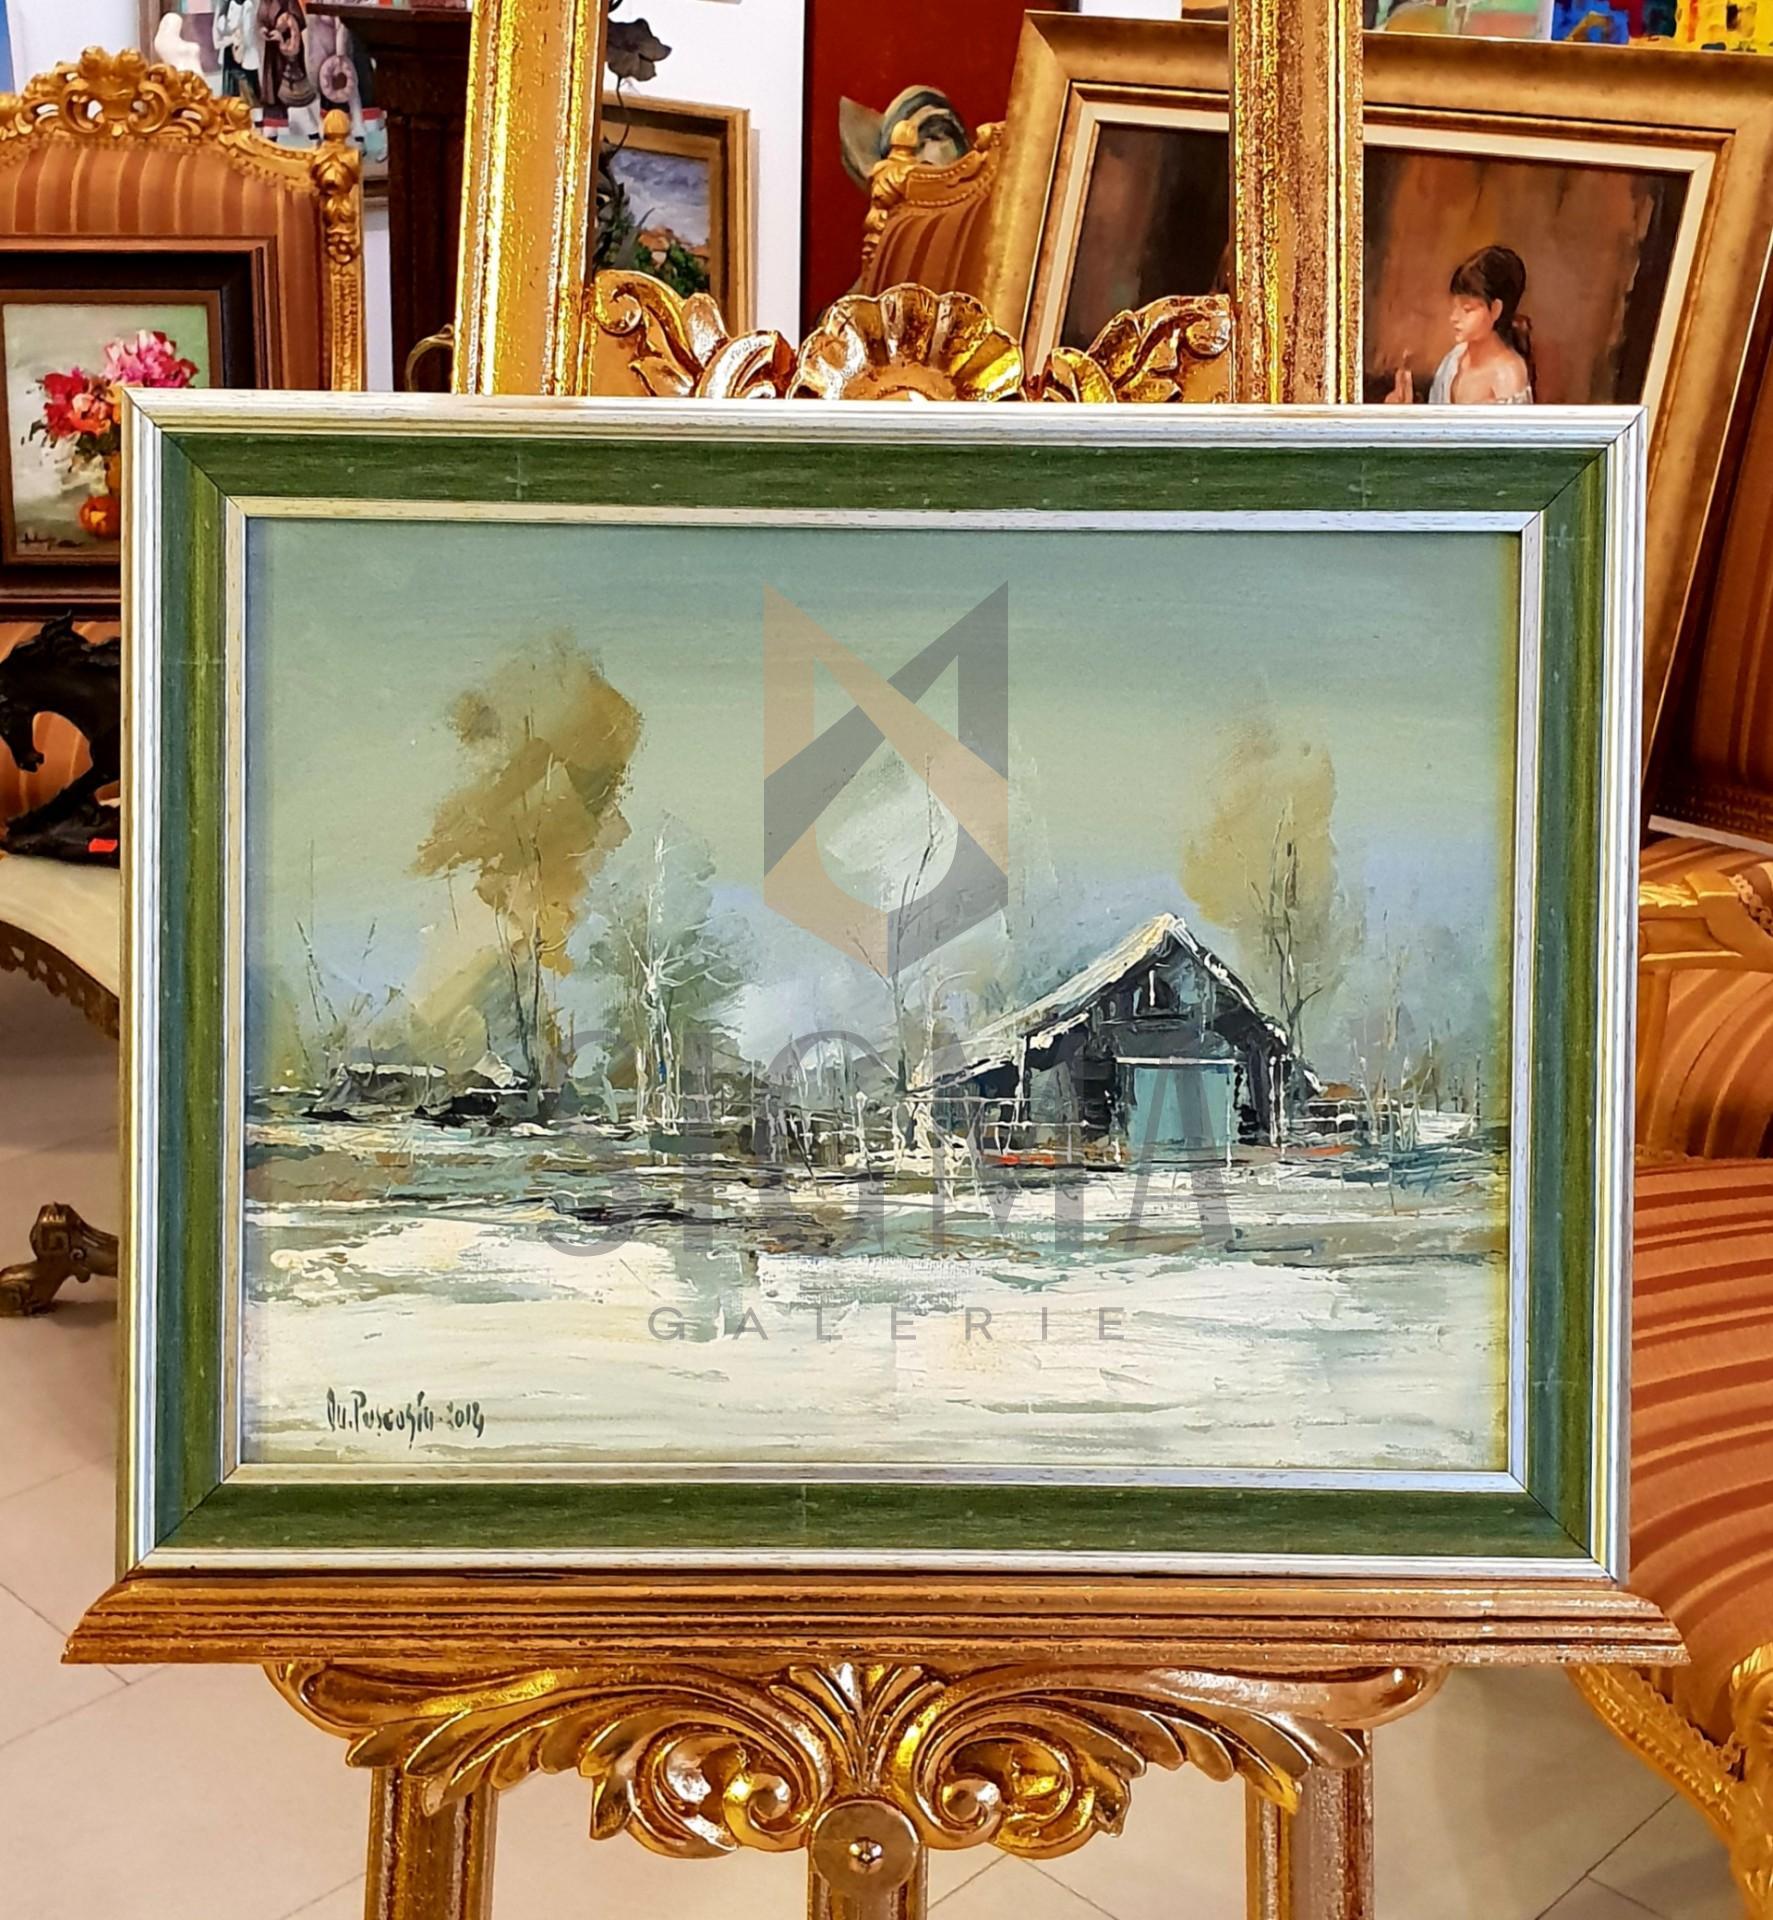 Tablou,  Ovidiu Puscasiu, Peisaj de iarna, u/p , Dim. : 30 x 40 cm